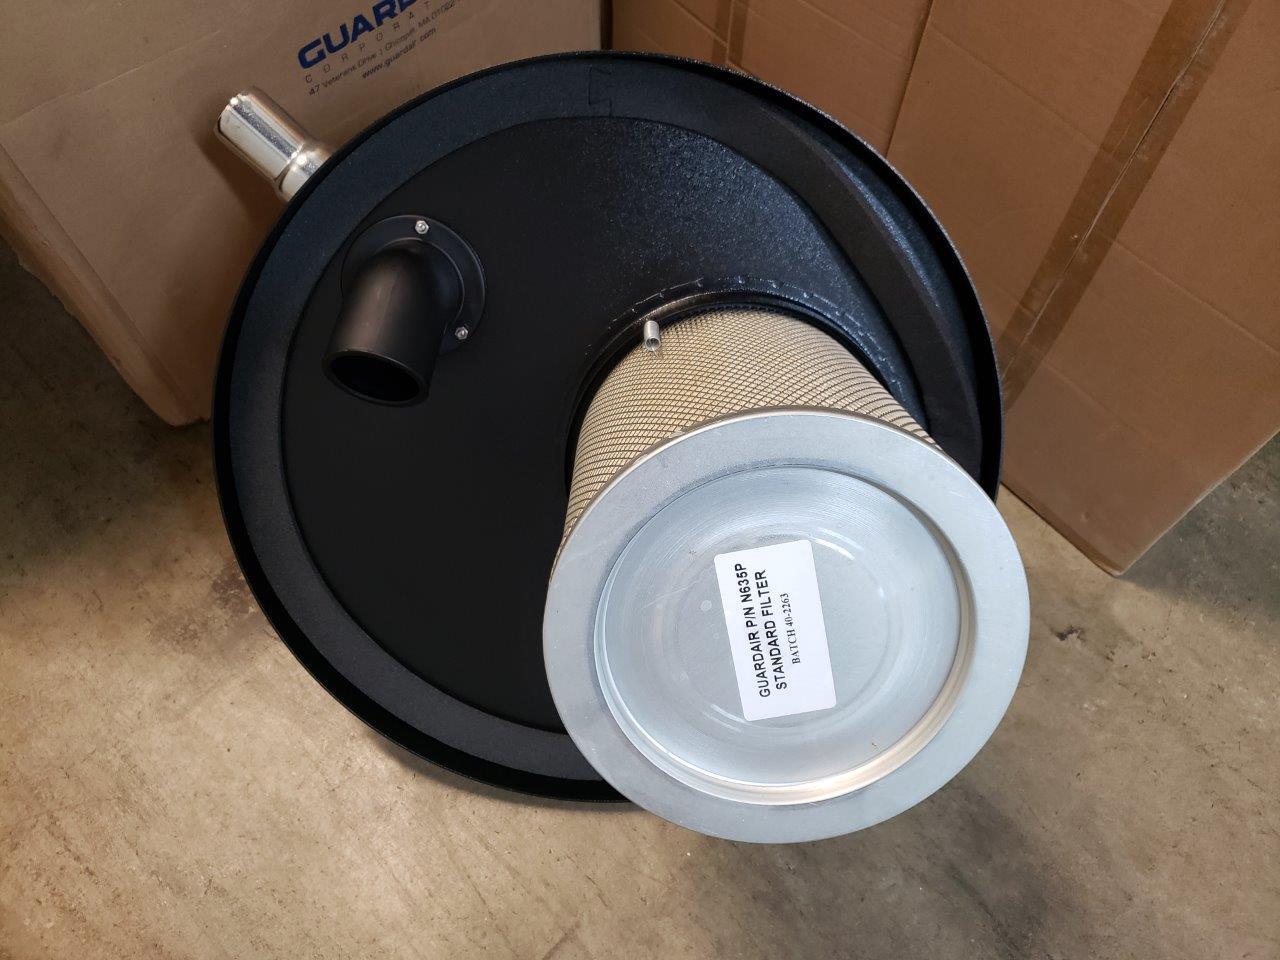 Guardair Pneumatic Vacuum Generating Head N552BK for Top of 55 Gallon Drum, Dual B Venturi, 2 inch Inlet and Attachment Kit like nortech tornado